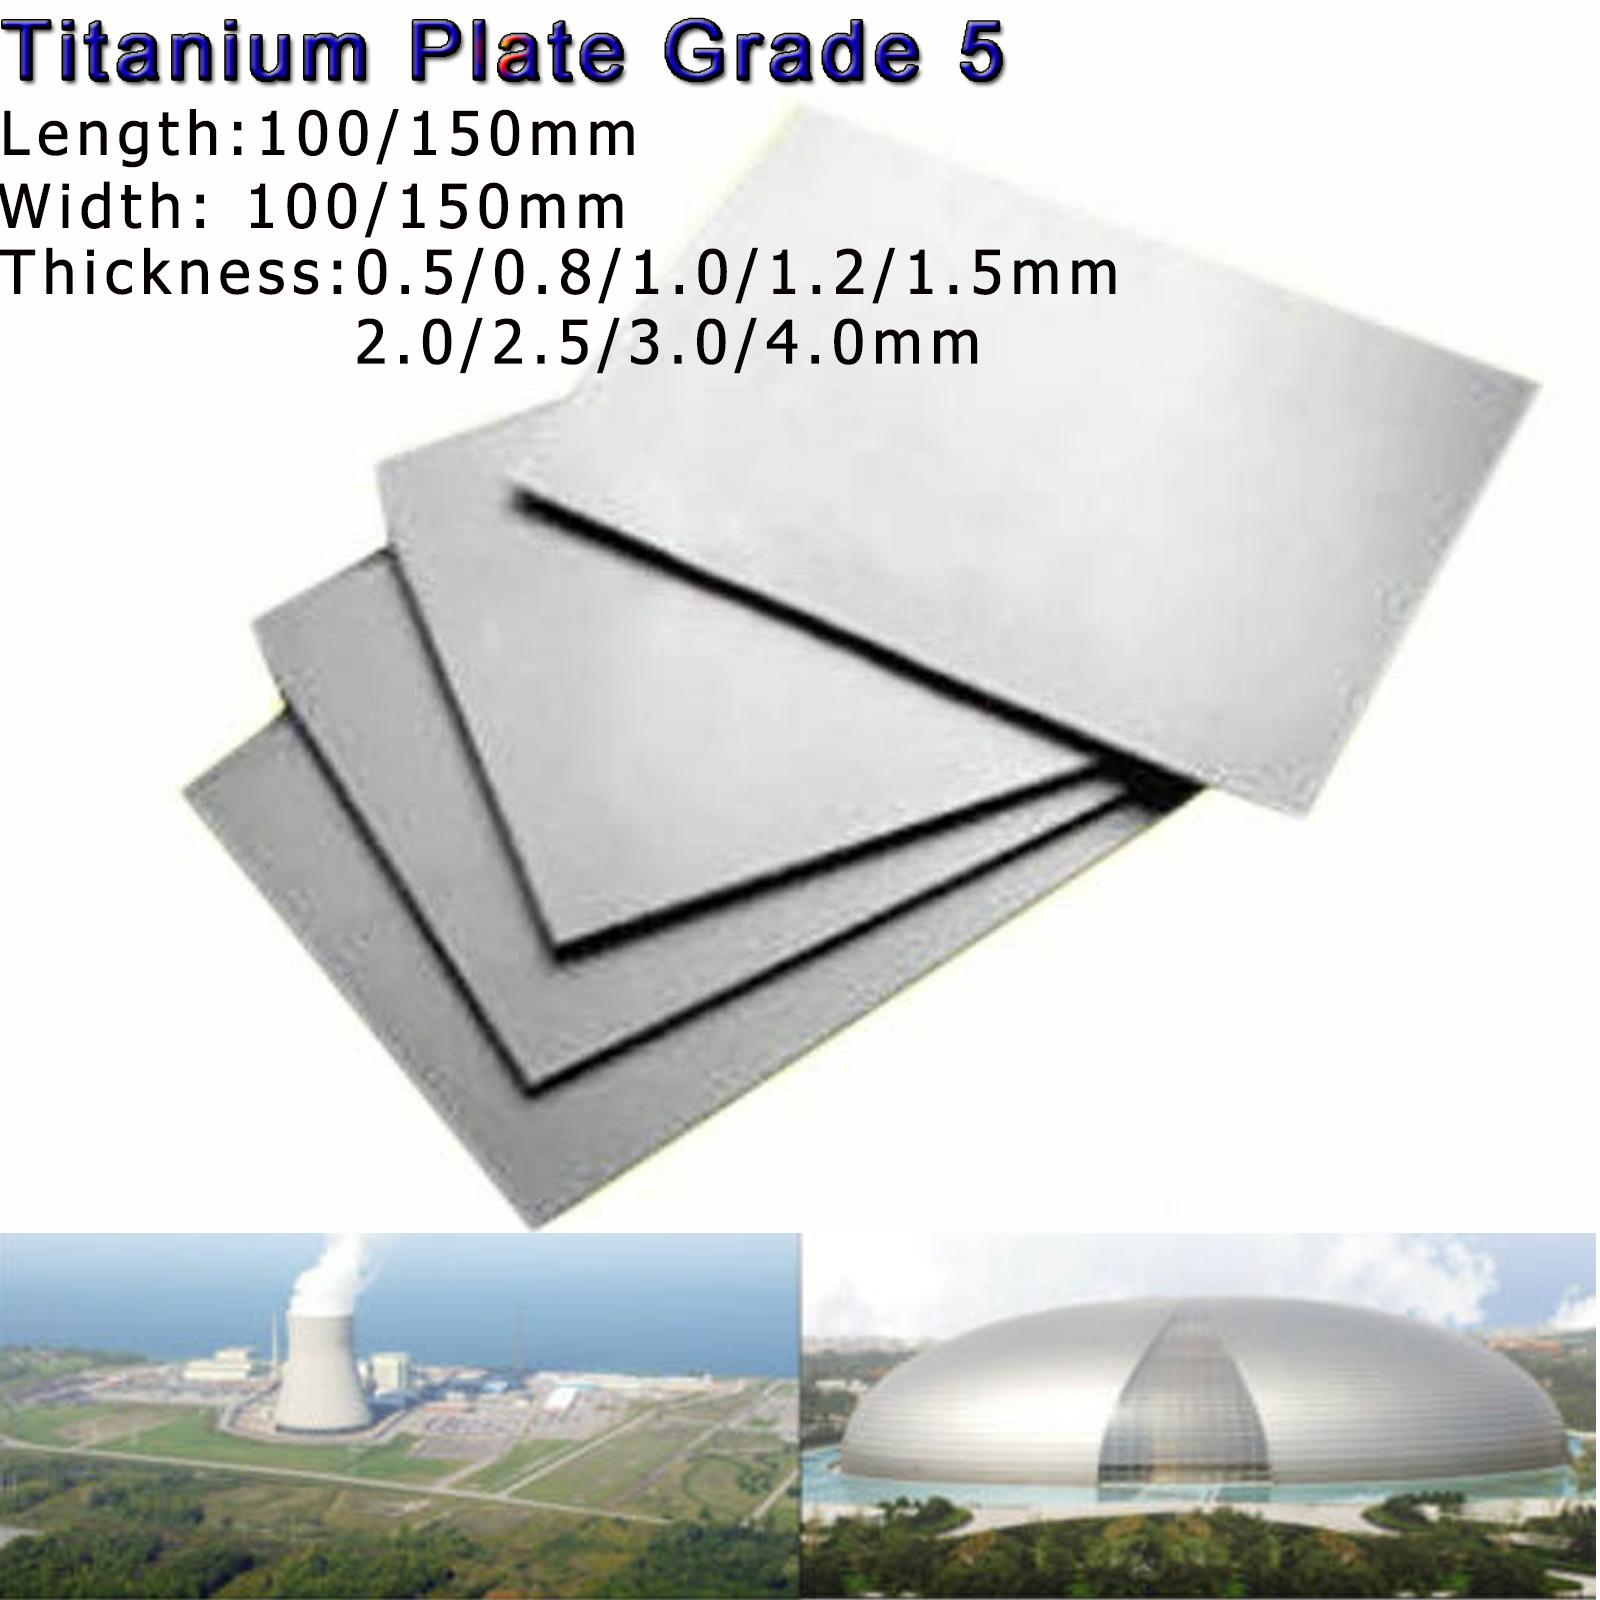 Titanium TC4//GR5 Sheet Ti Metal Plate Metalworking Panel Select 0.5mm-3mm thick